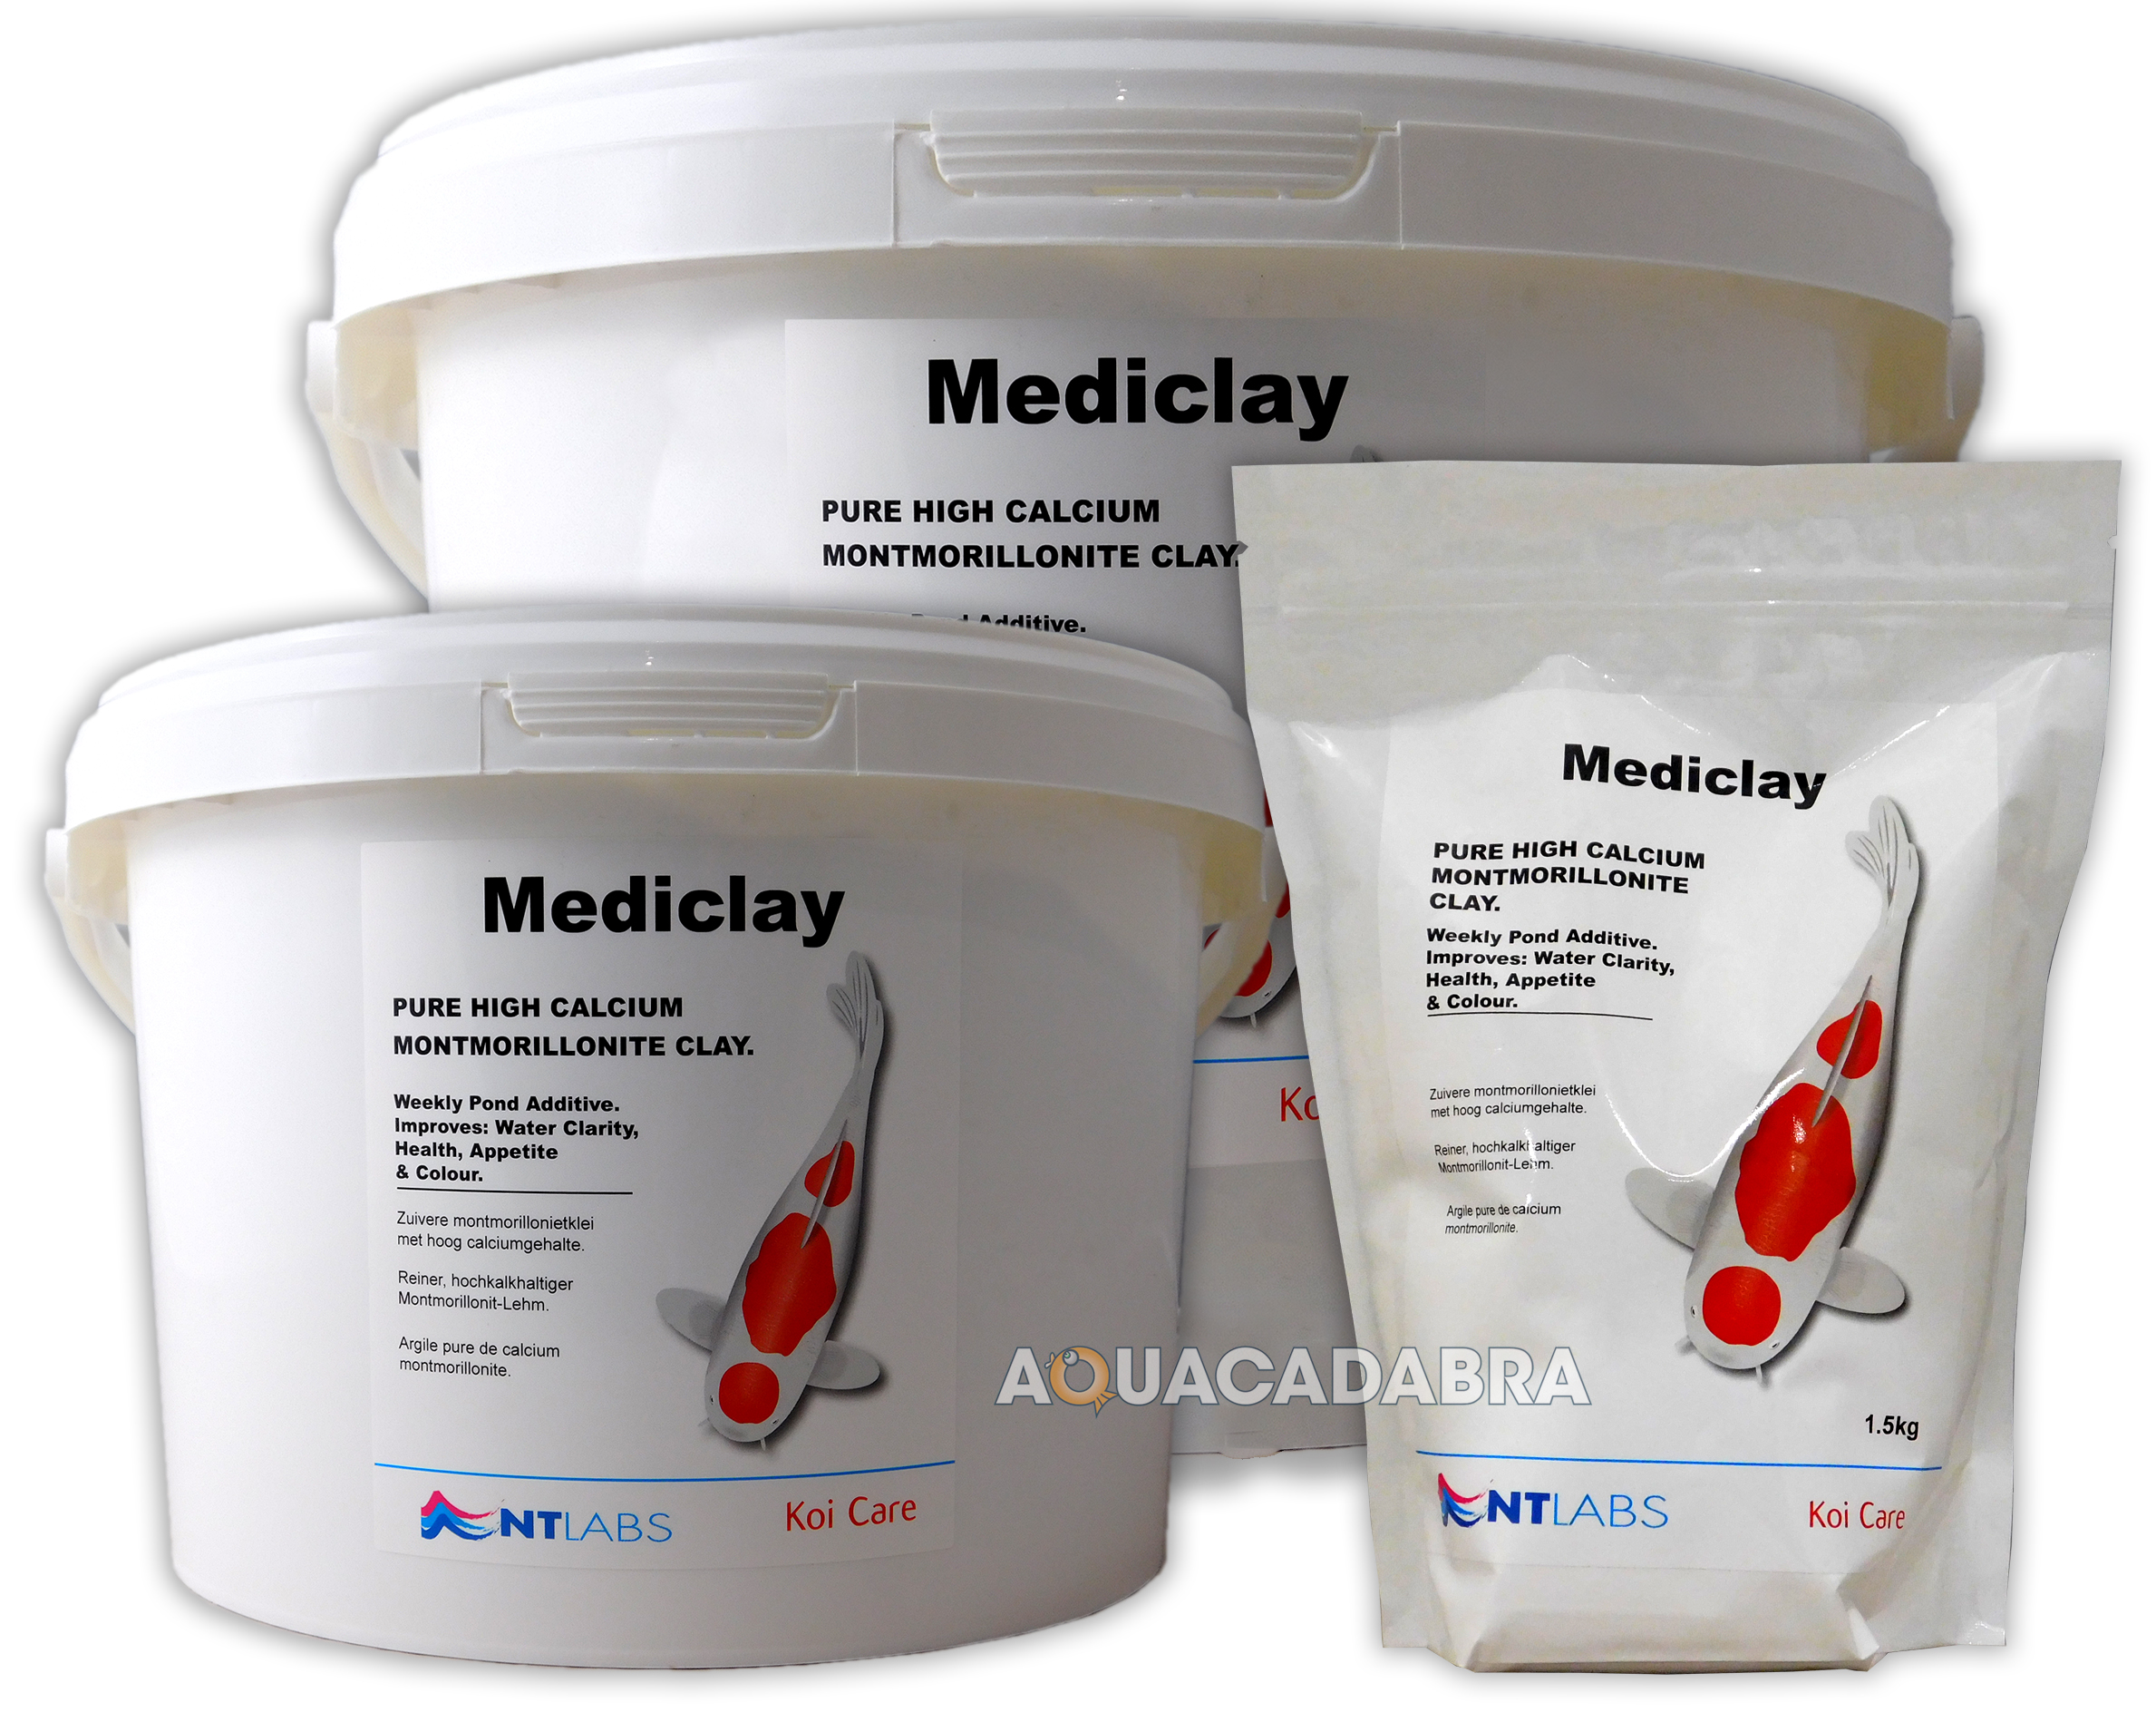 Nt labs mediclay 1 5kg 5kg 20kg montmorillonite clay algae for Koi pond traduzione